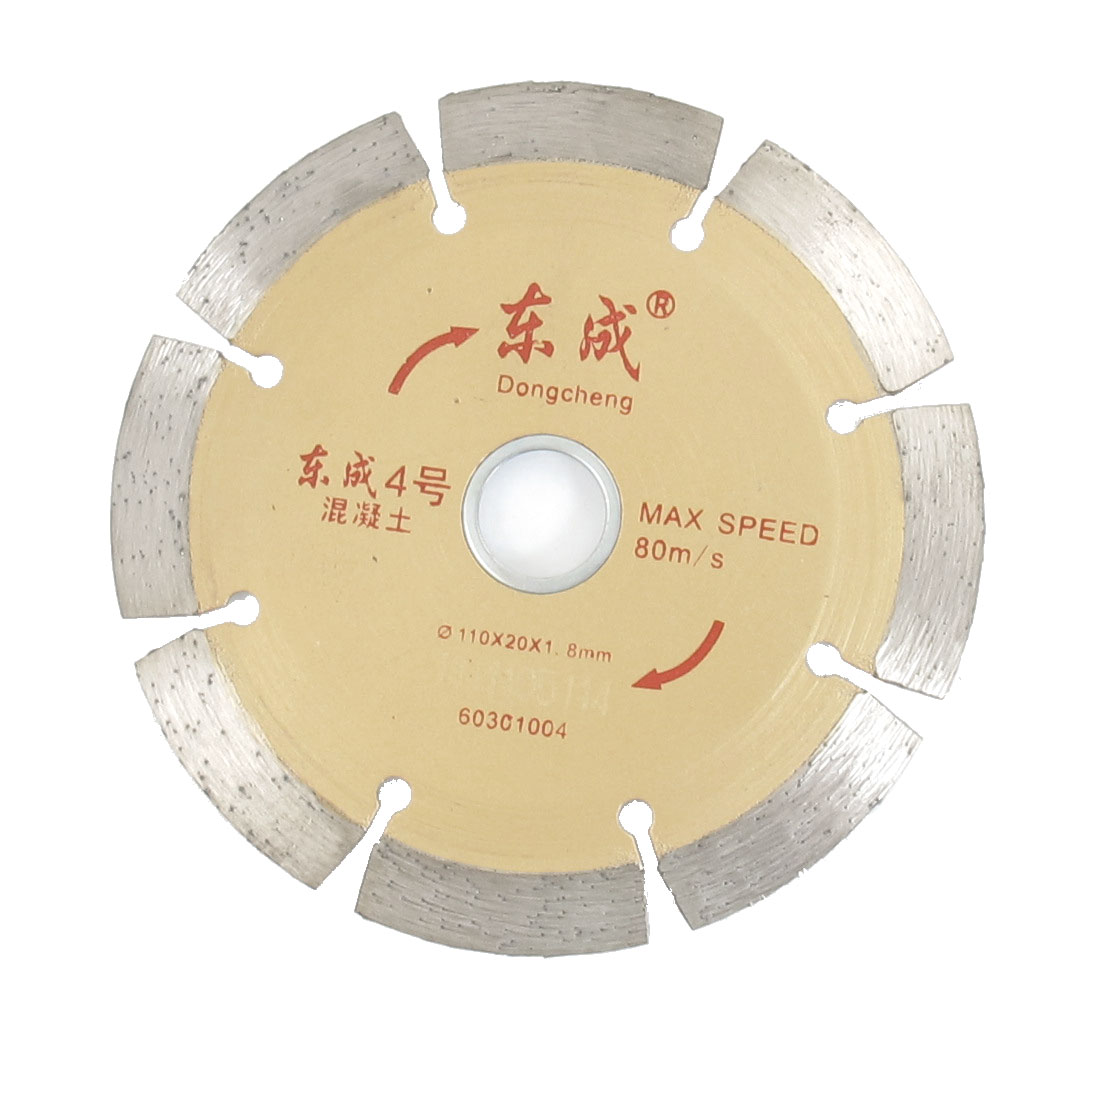 Concrete Cutting Wheel 110mm x 20mm x 1.8mm Diamond Disc Saw Cutter